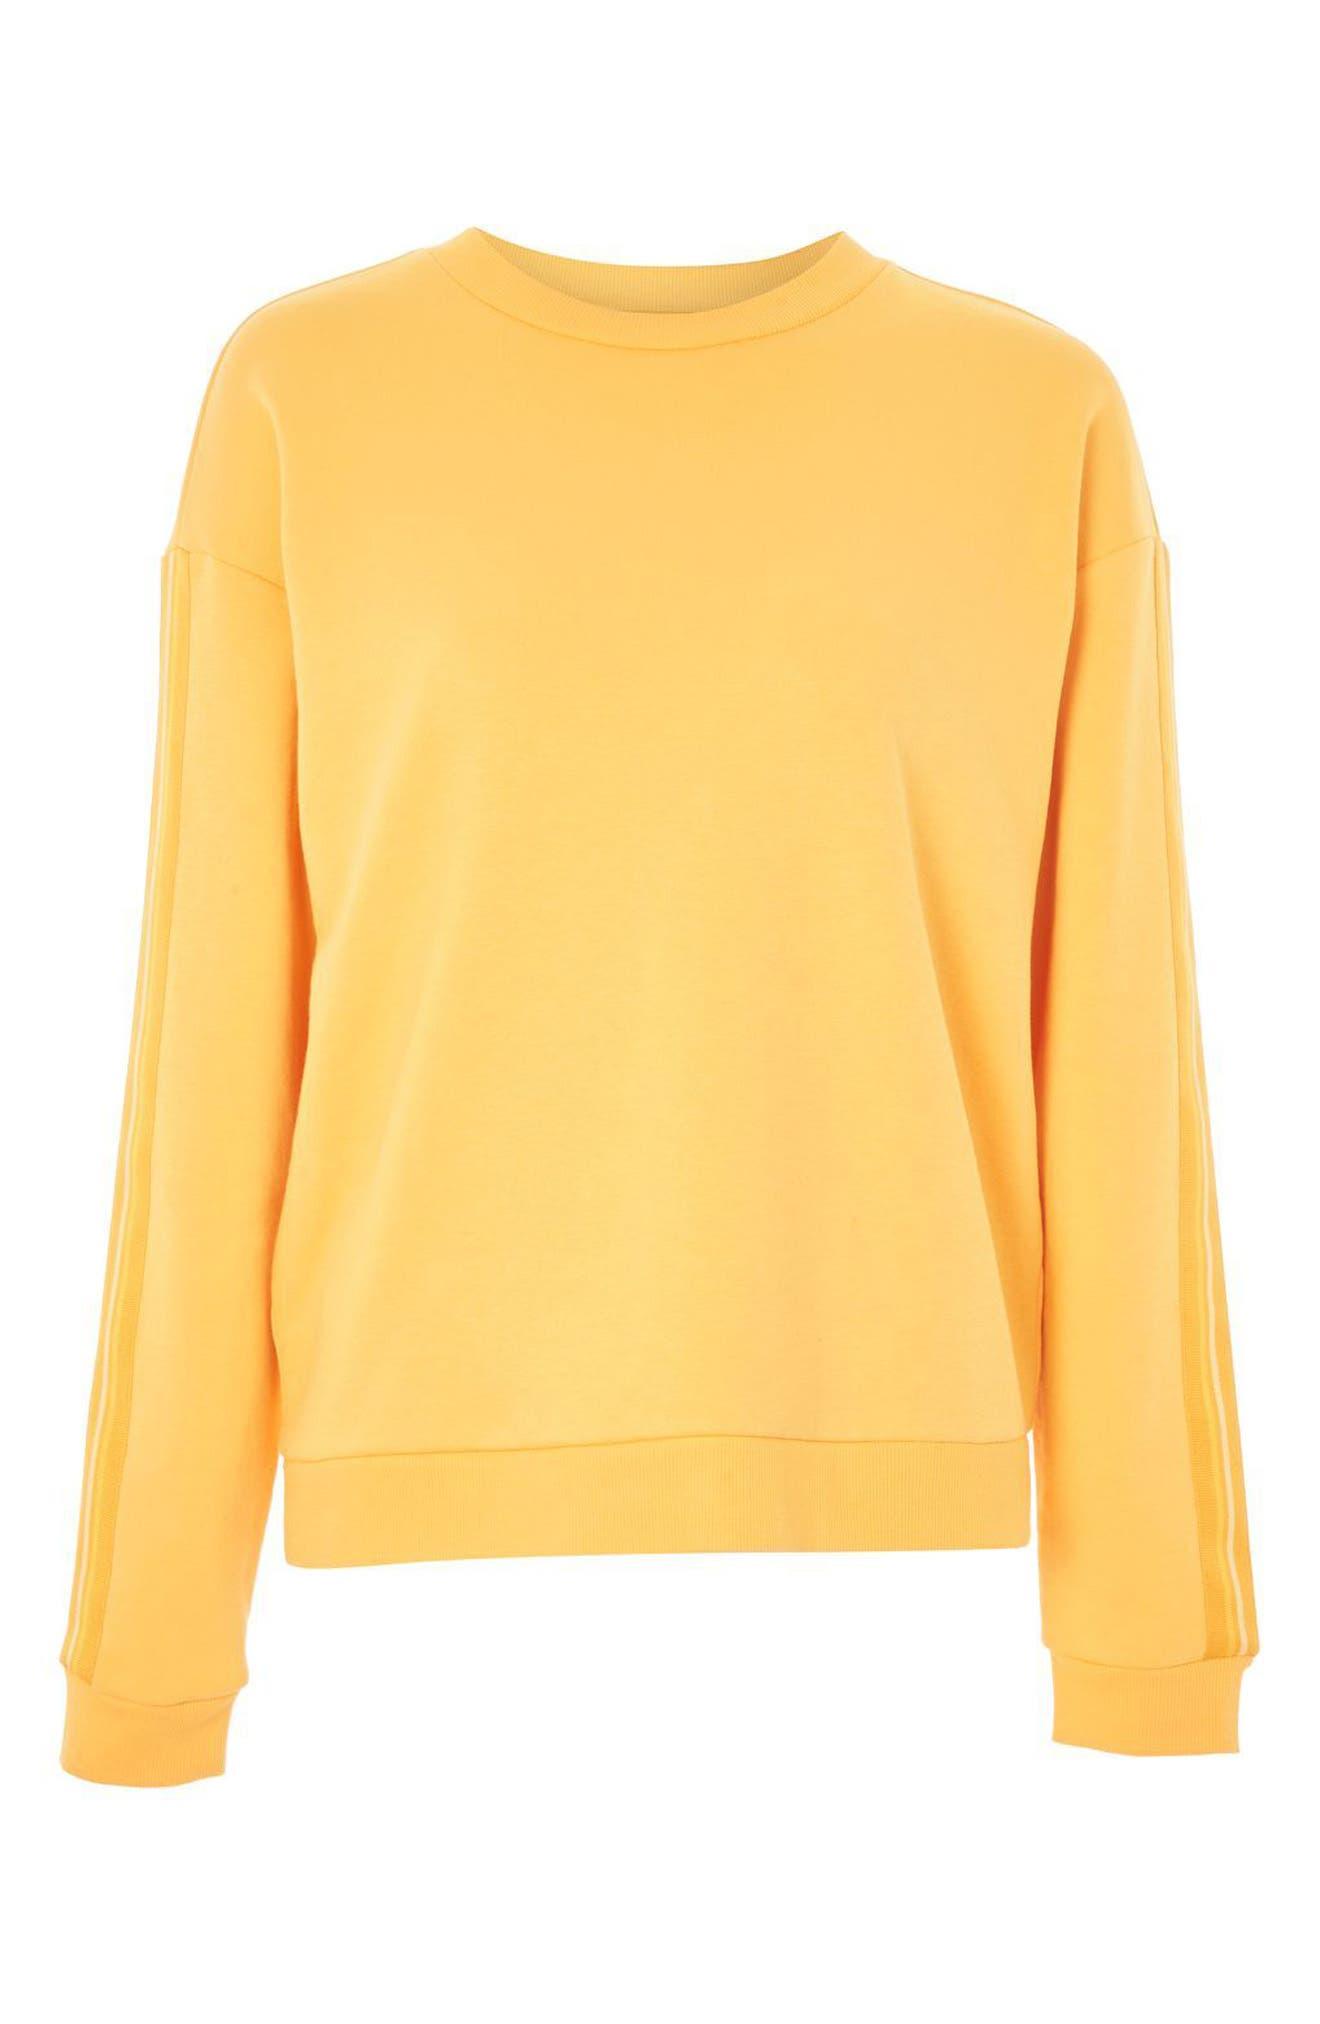 Taped Sleeve Sweatshirt,                             Alternate thumbnail 4, color,                             Mustard